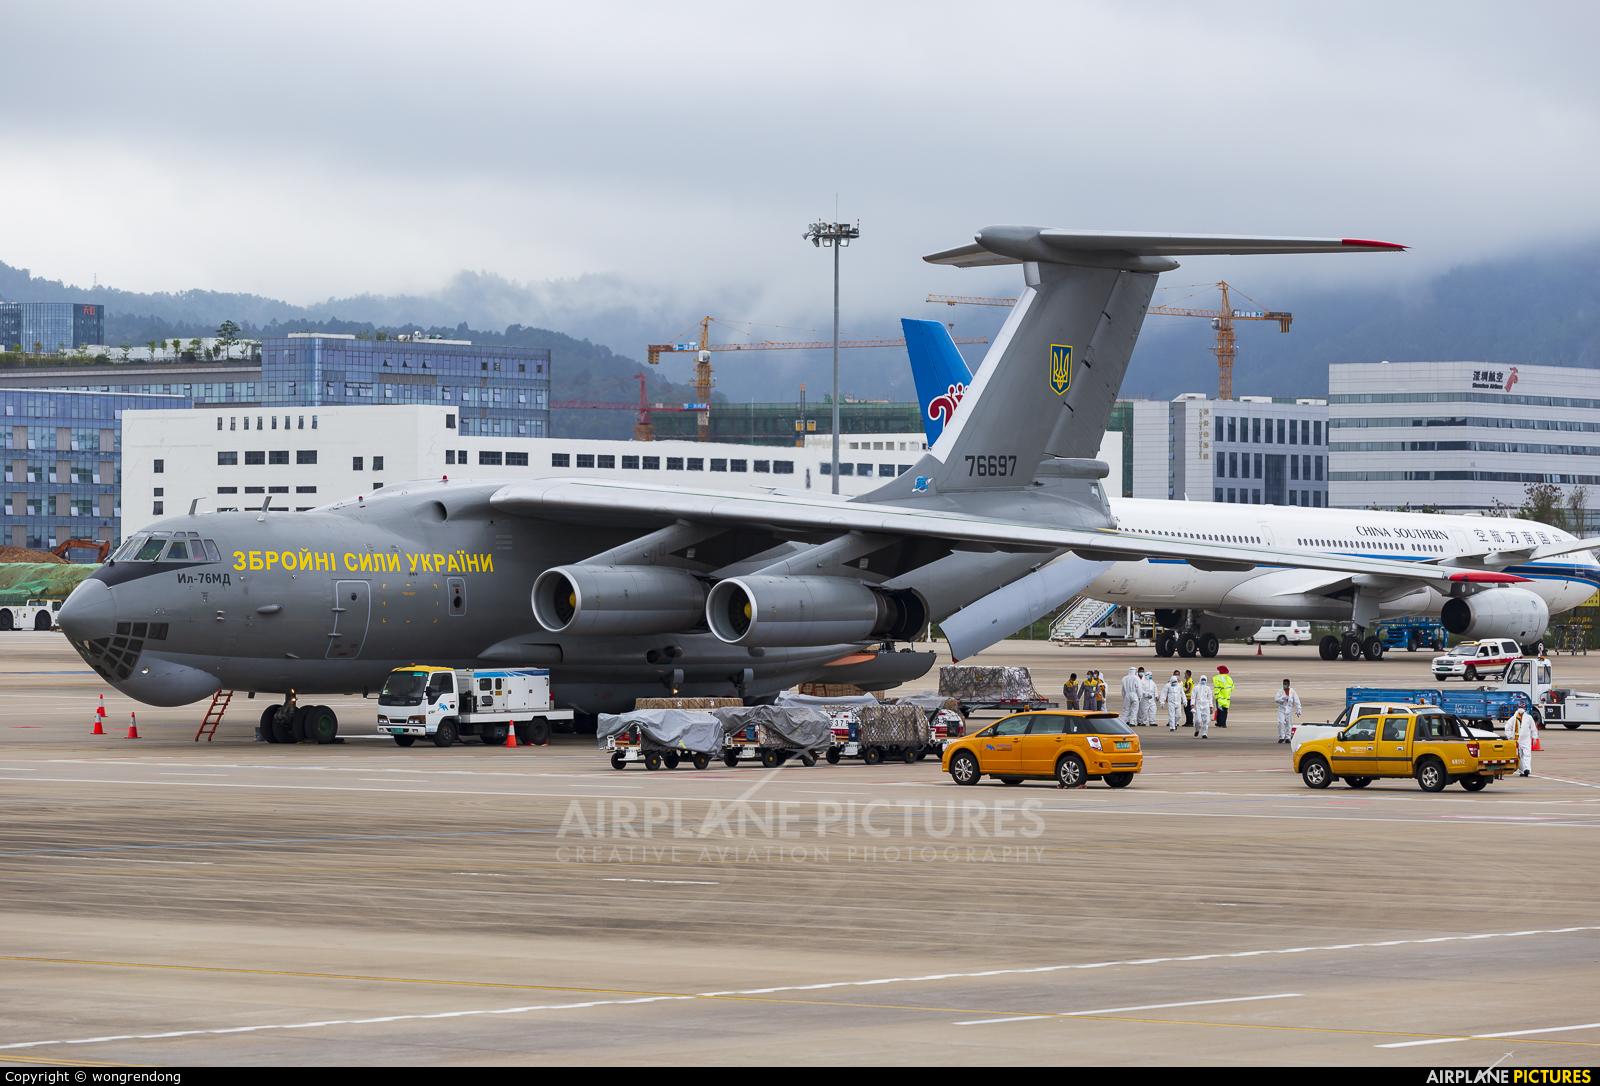 Ukraine - Air Force 76697 aircraft at Shenzhen Bao\